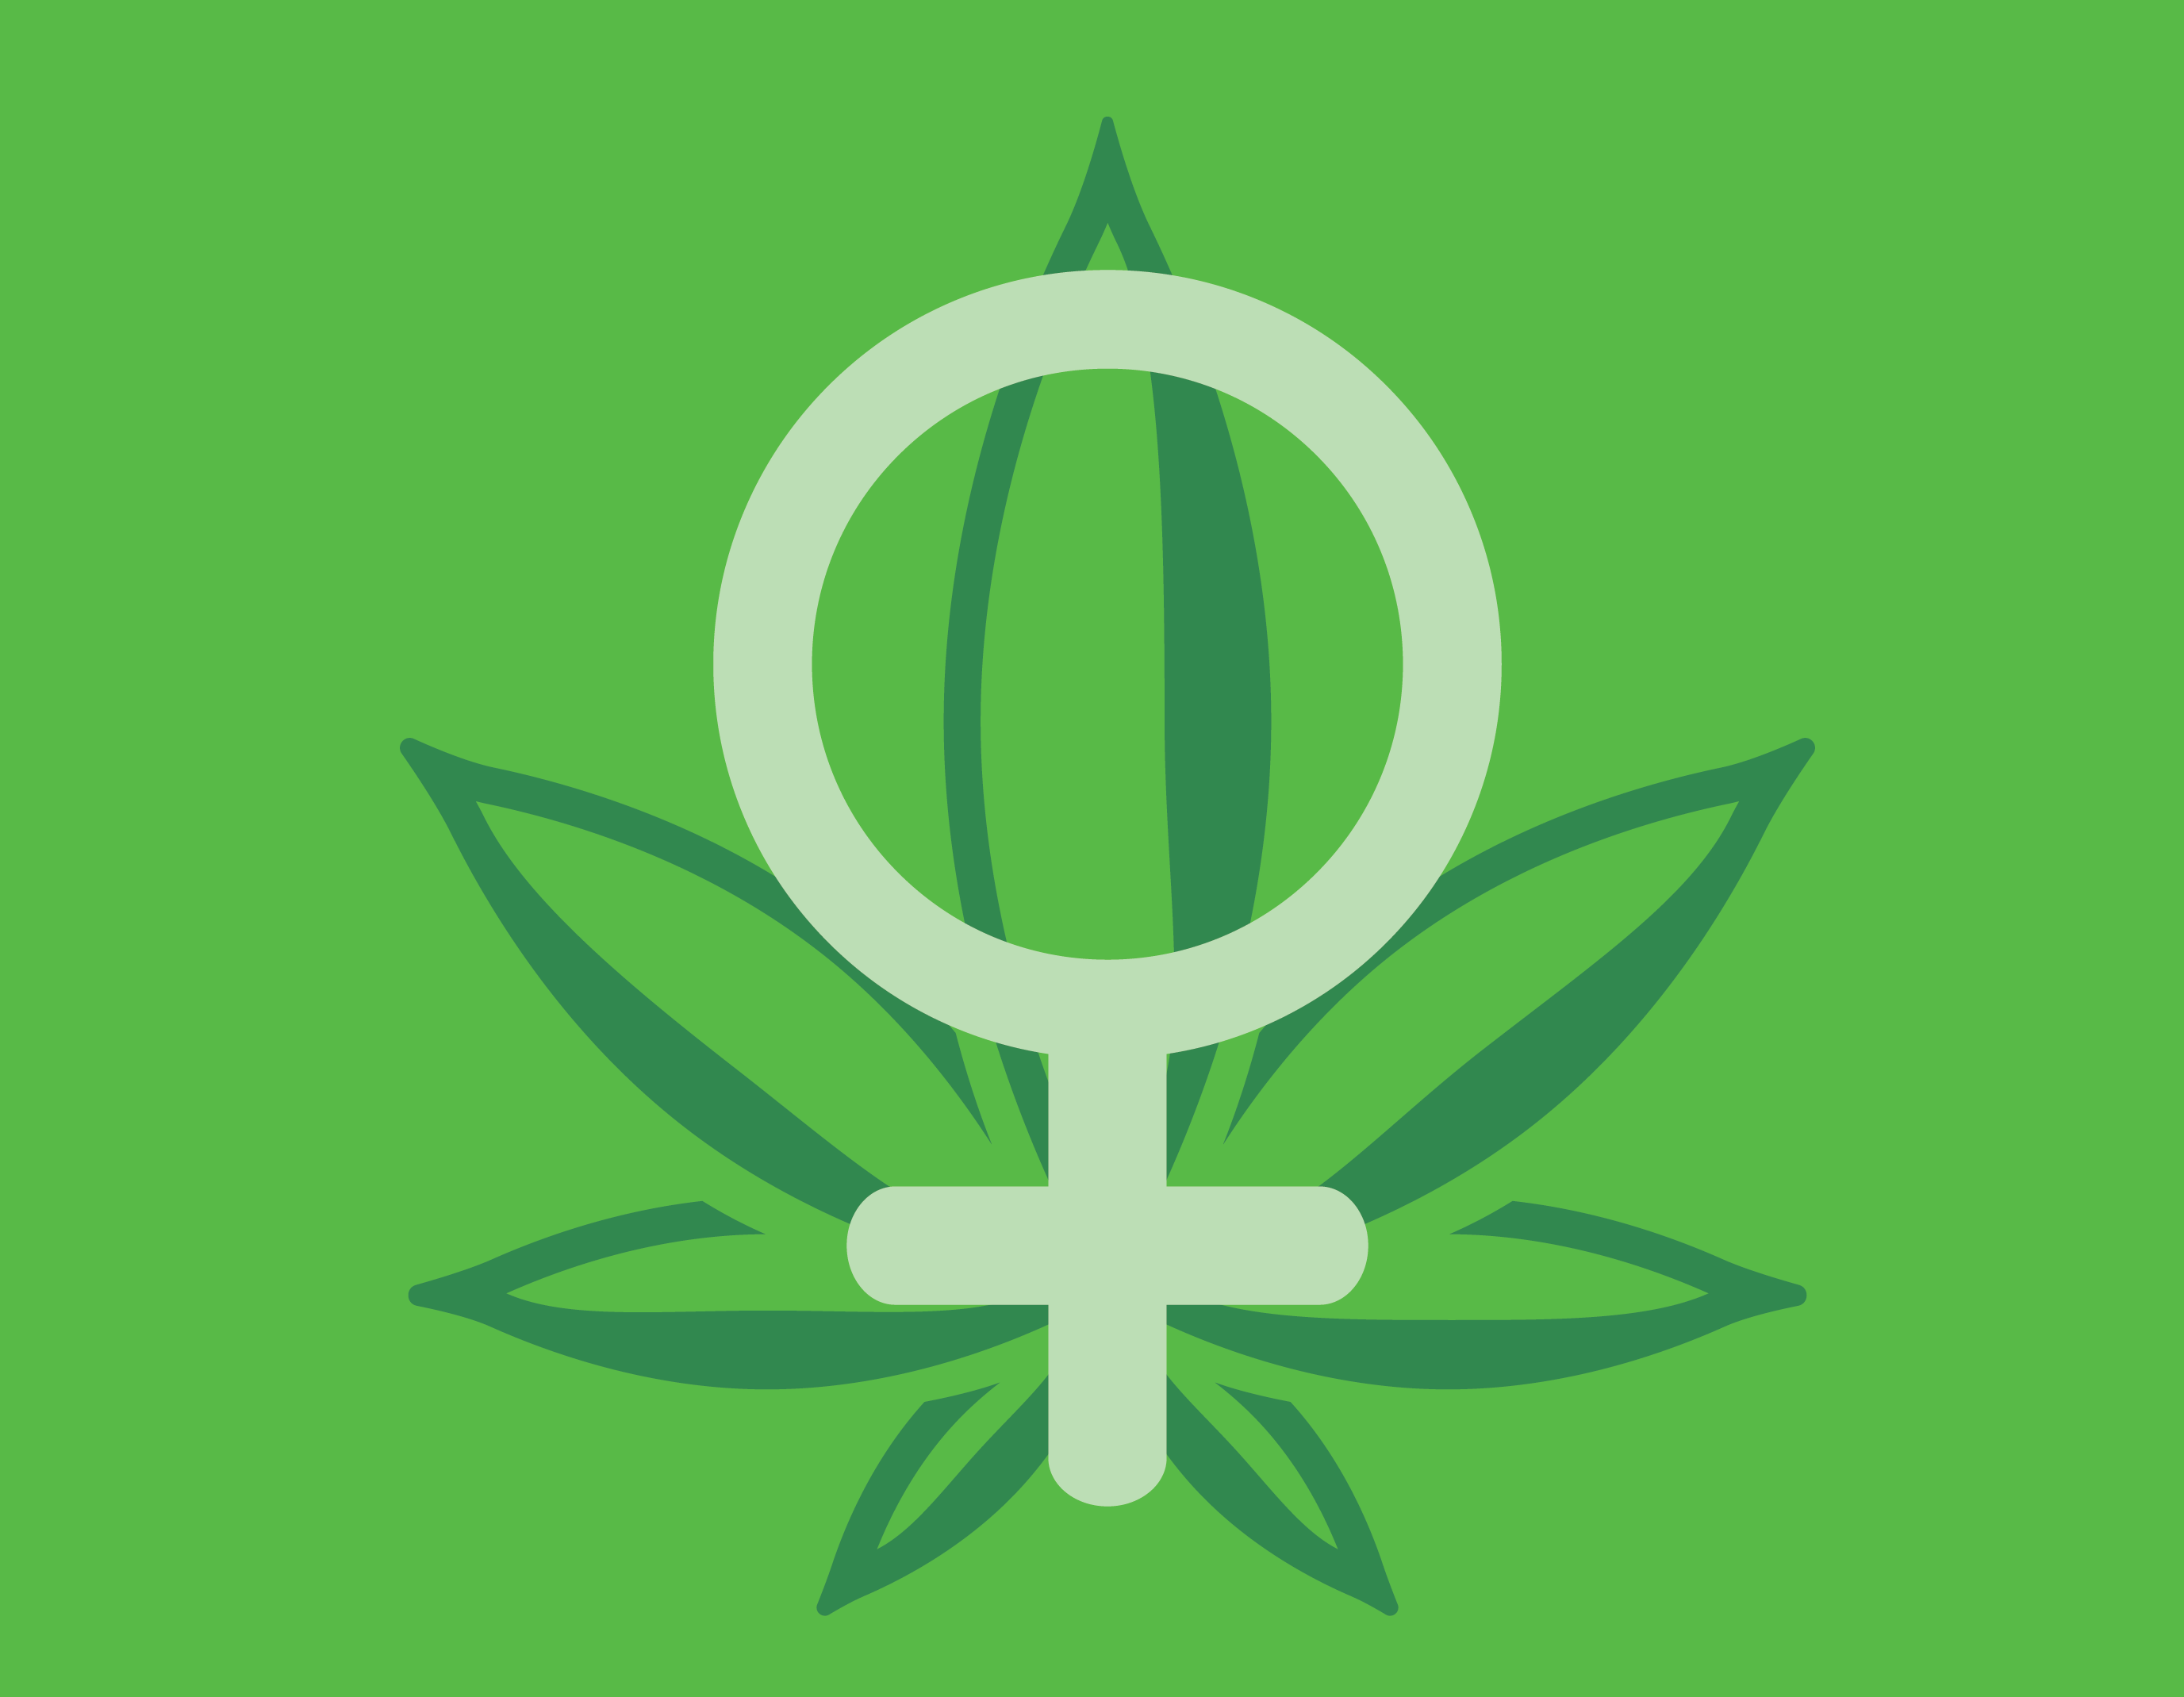 woman cannabis marijuana consume tastes preferences royal queen seeds favorite